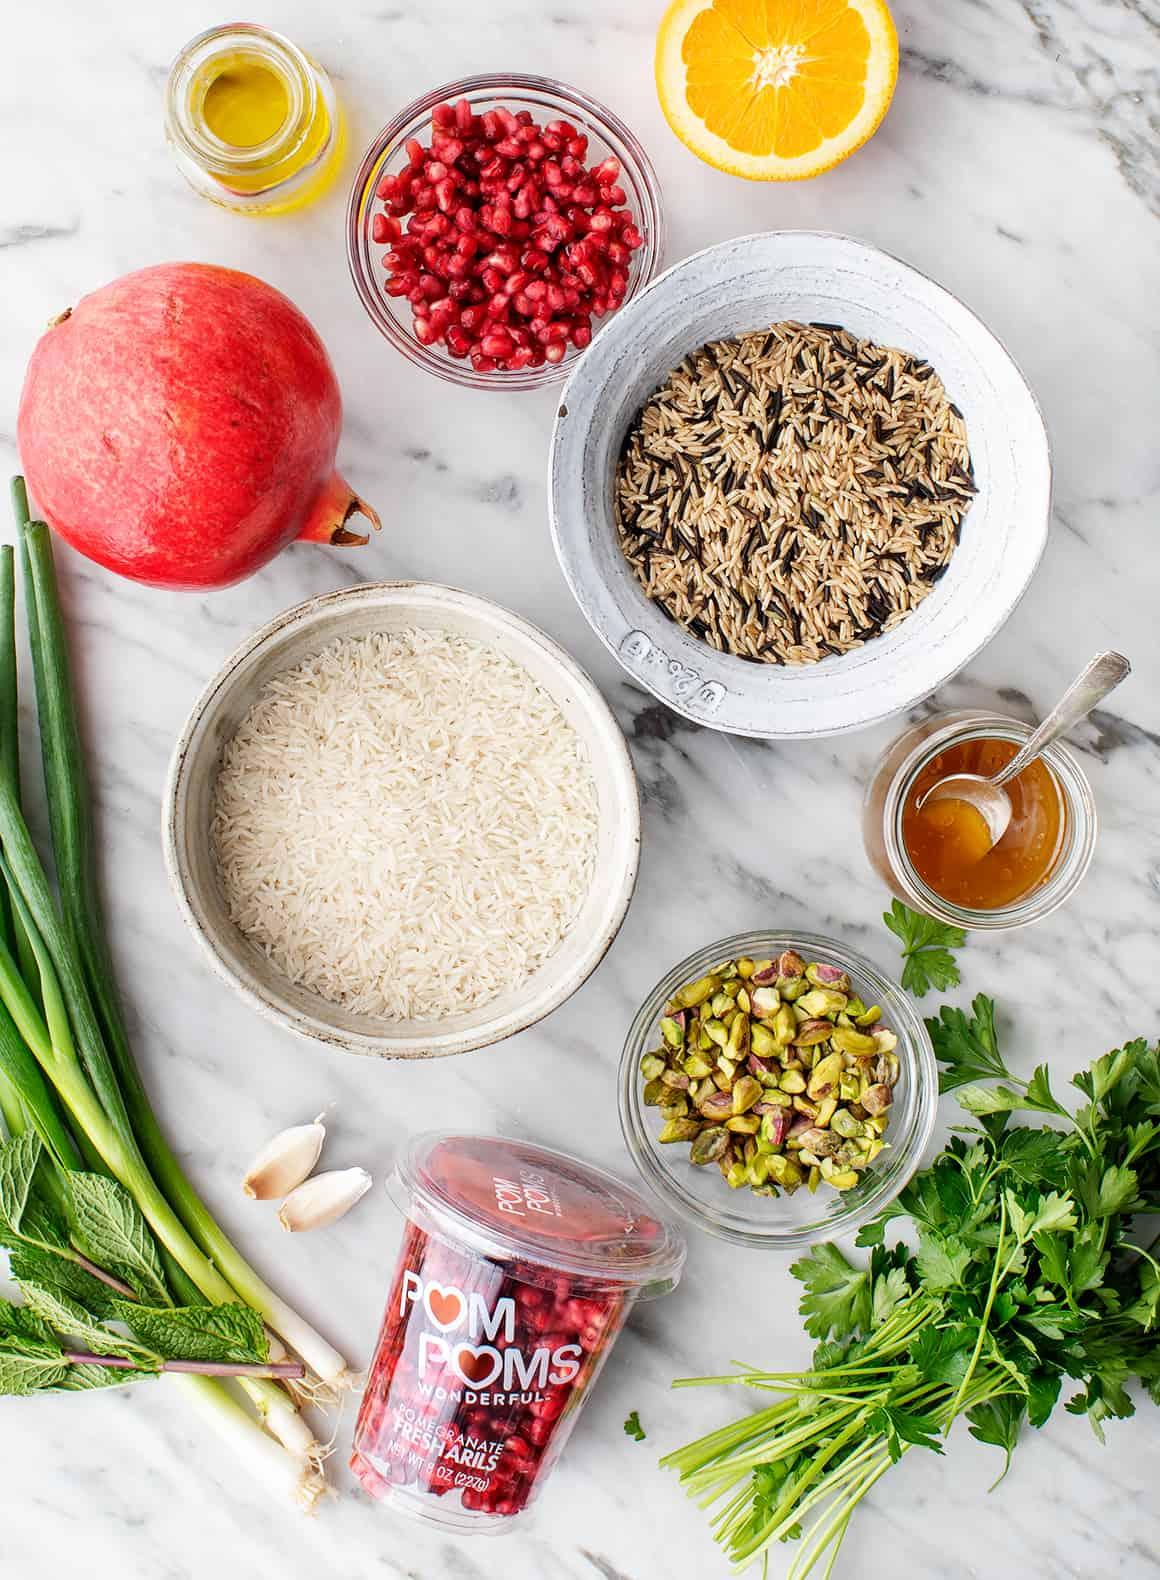 Recipe ingredients on marble